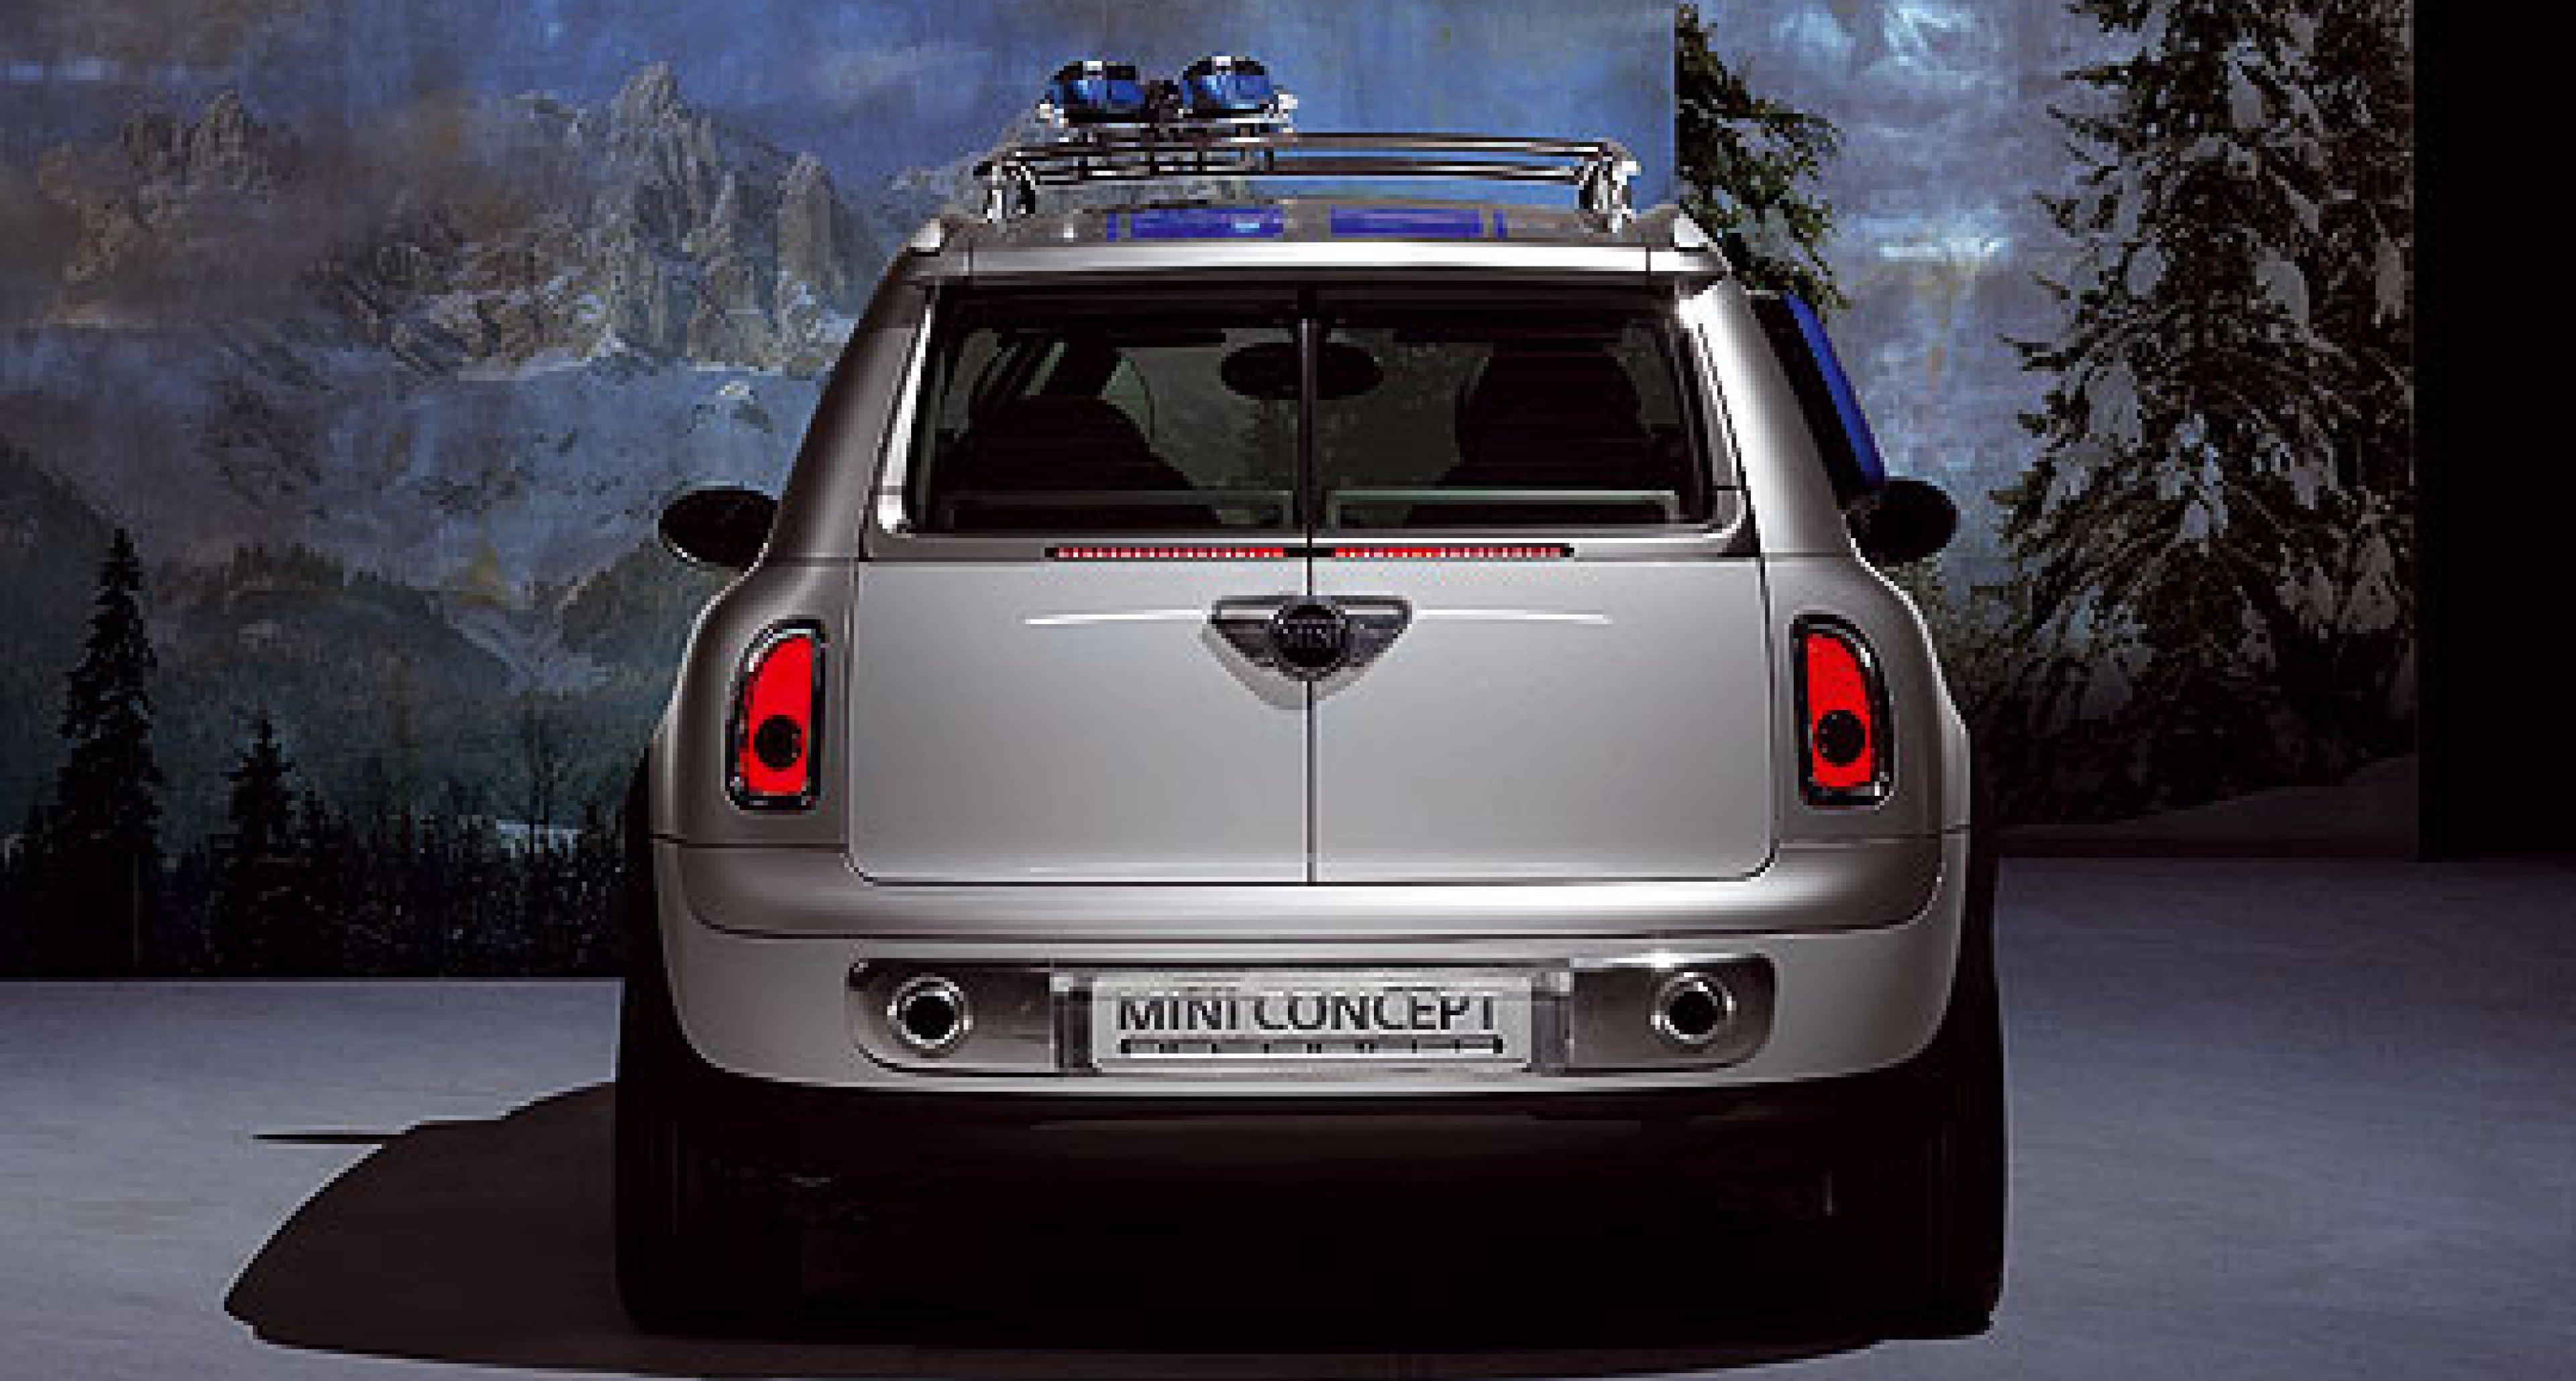 Mini Concept Detroit: Mini goes sporty